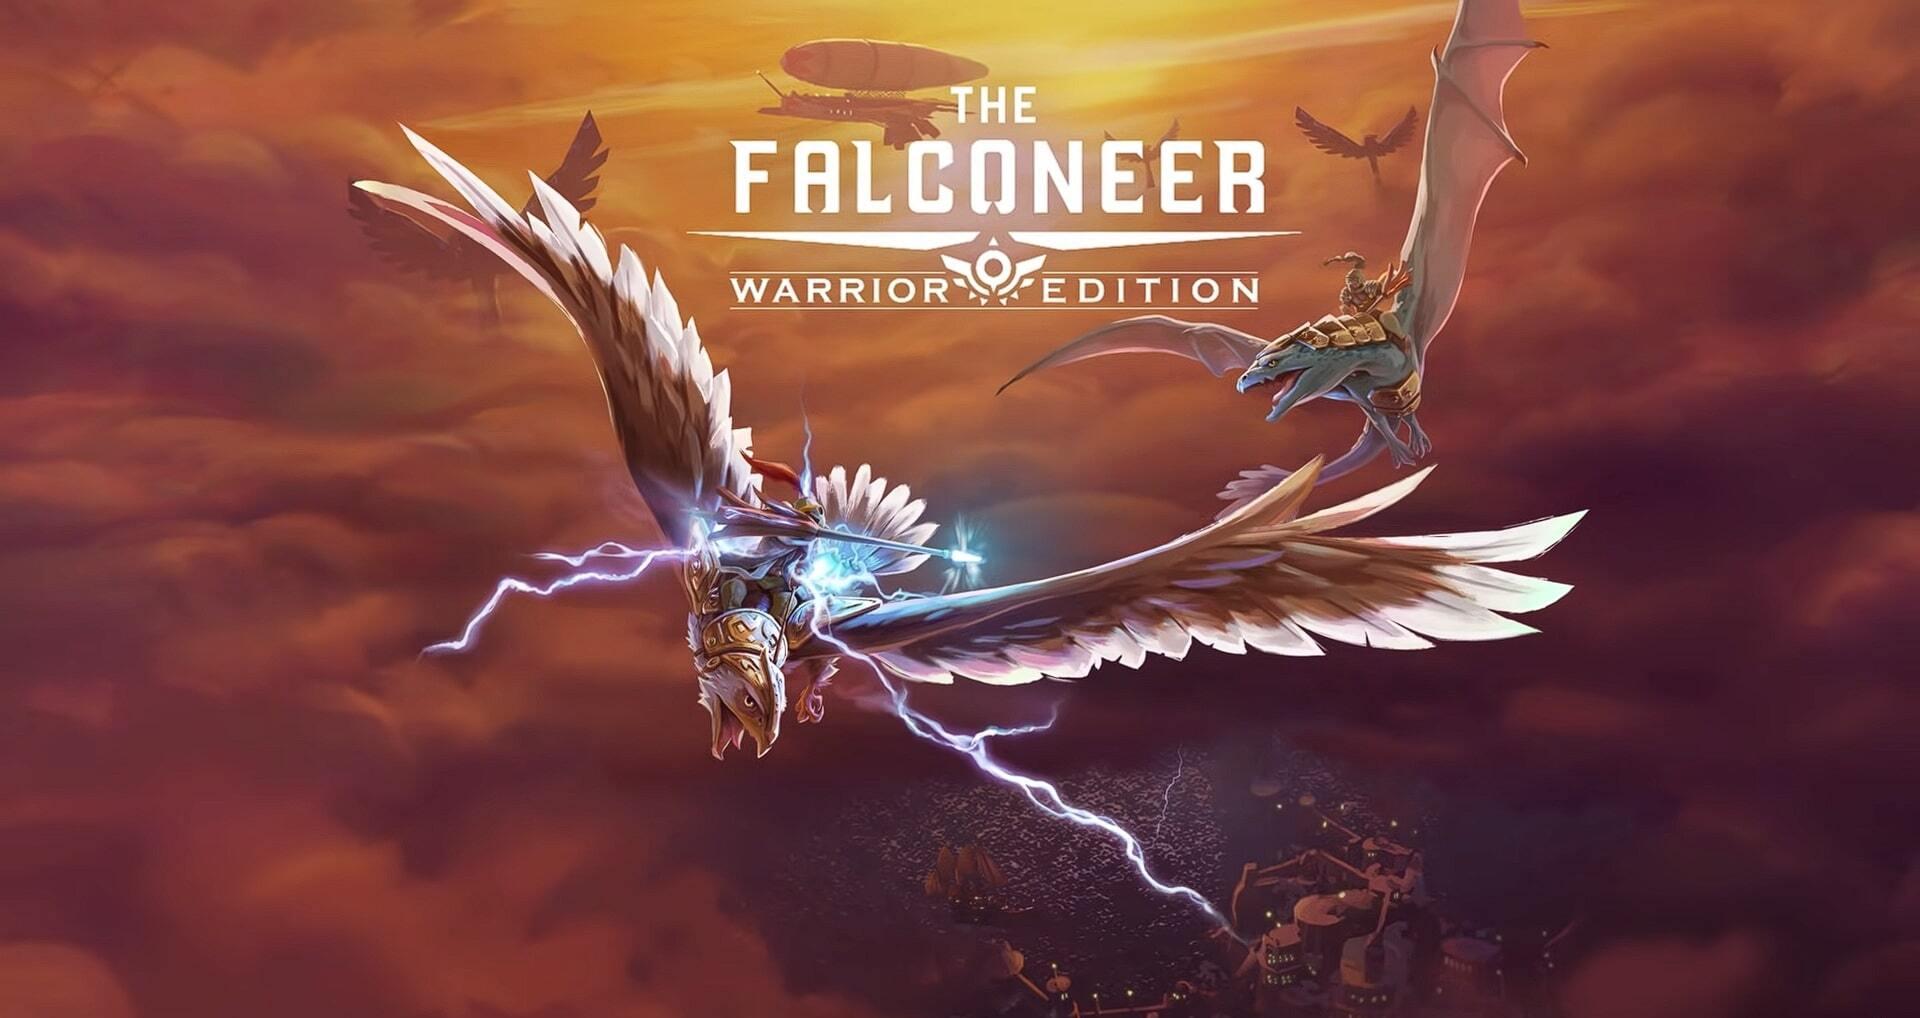 the-falconeer-warrior-edition